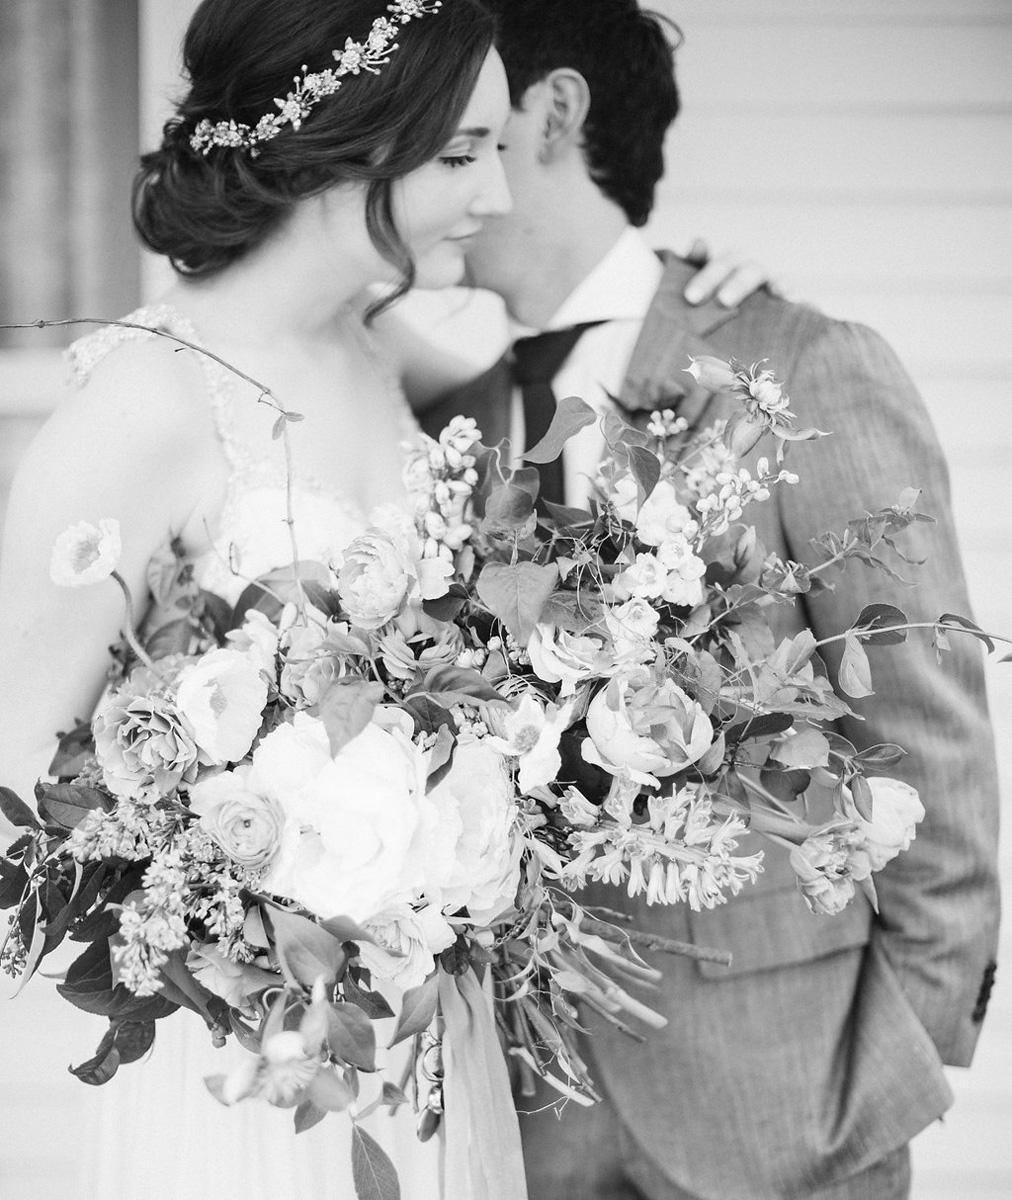 natalie_watson_blackberryfarm_wedding_larkine031.jpg